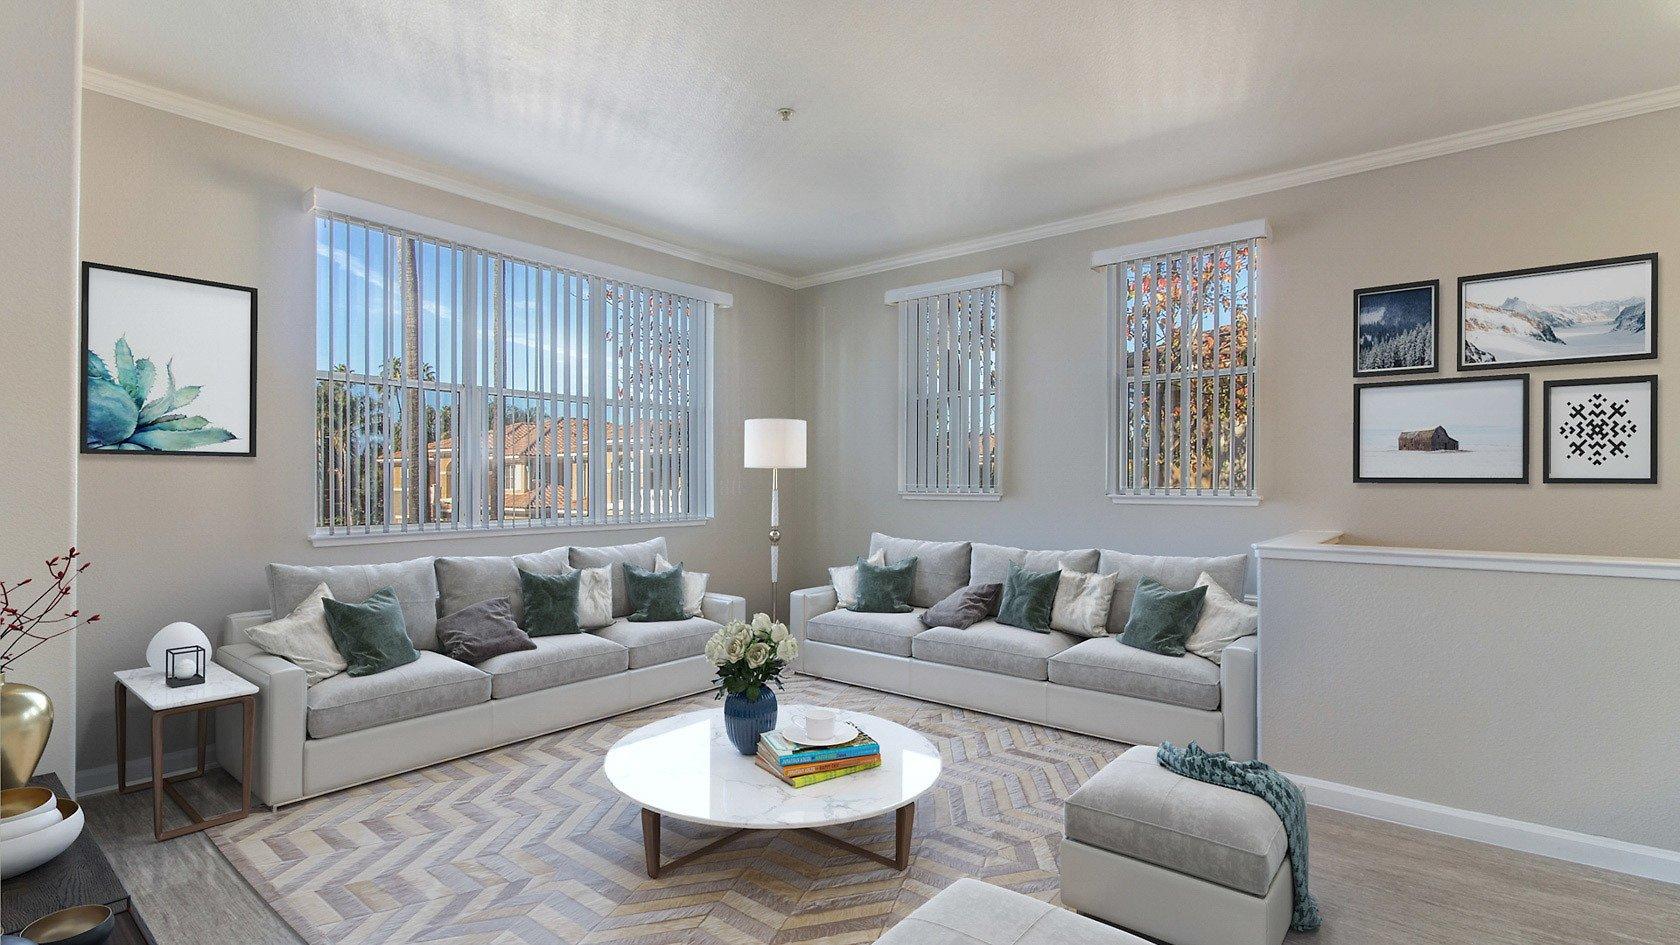 Villa Veneto Extended Stay-Sample Image of San Jose CA Temporary Apartments